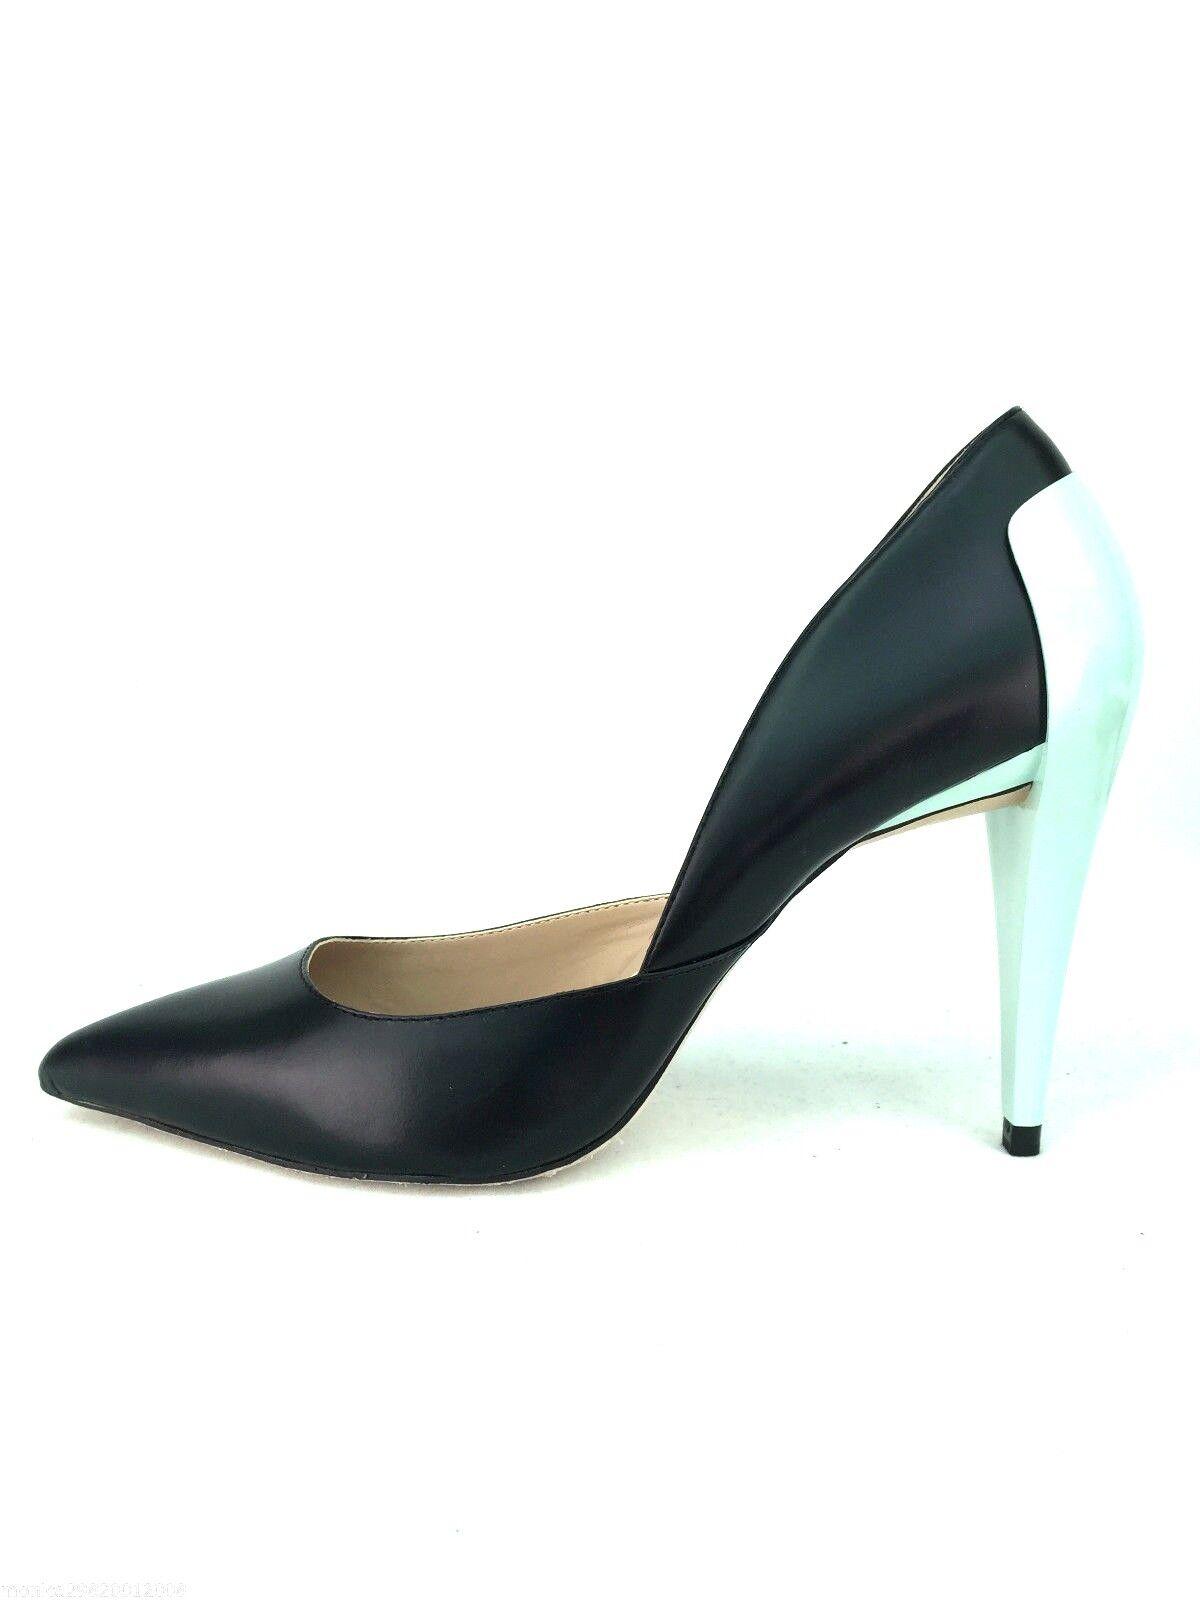 Zara Leder Absatz Asymmetrische Pumps UK5 UK6